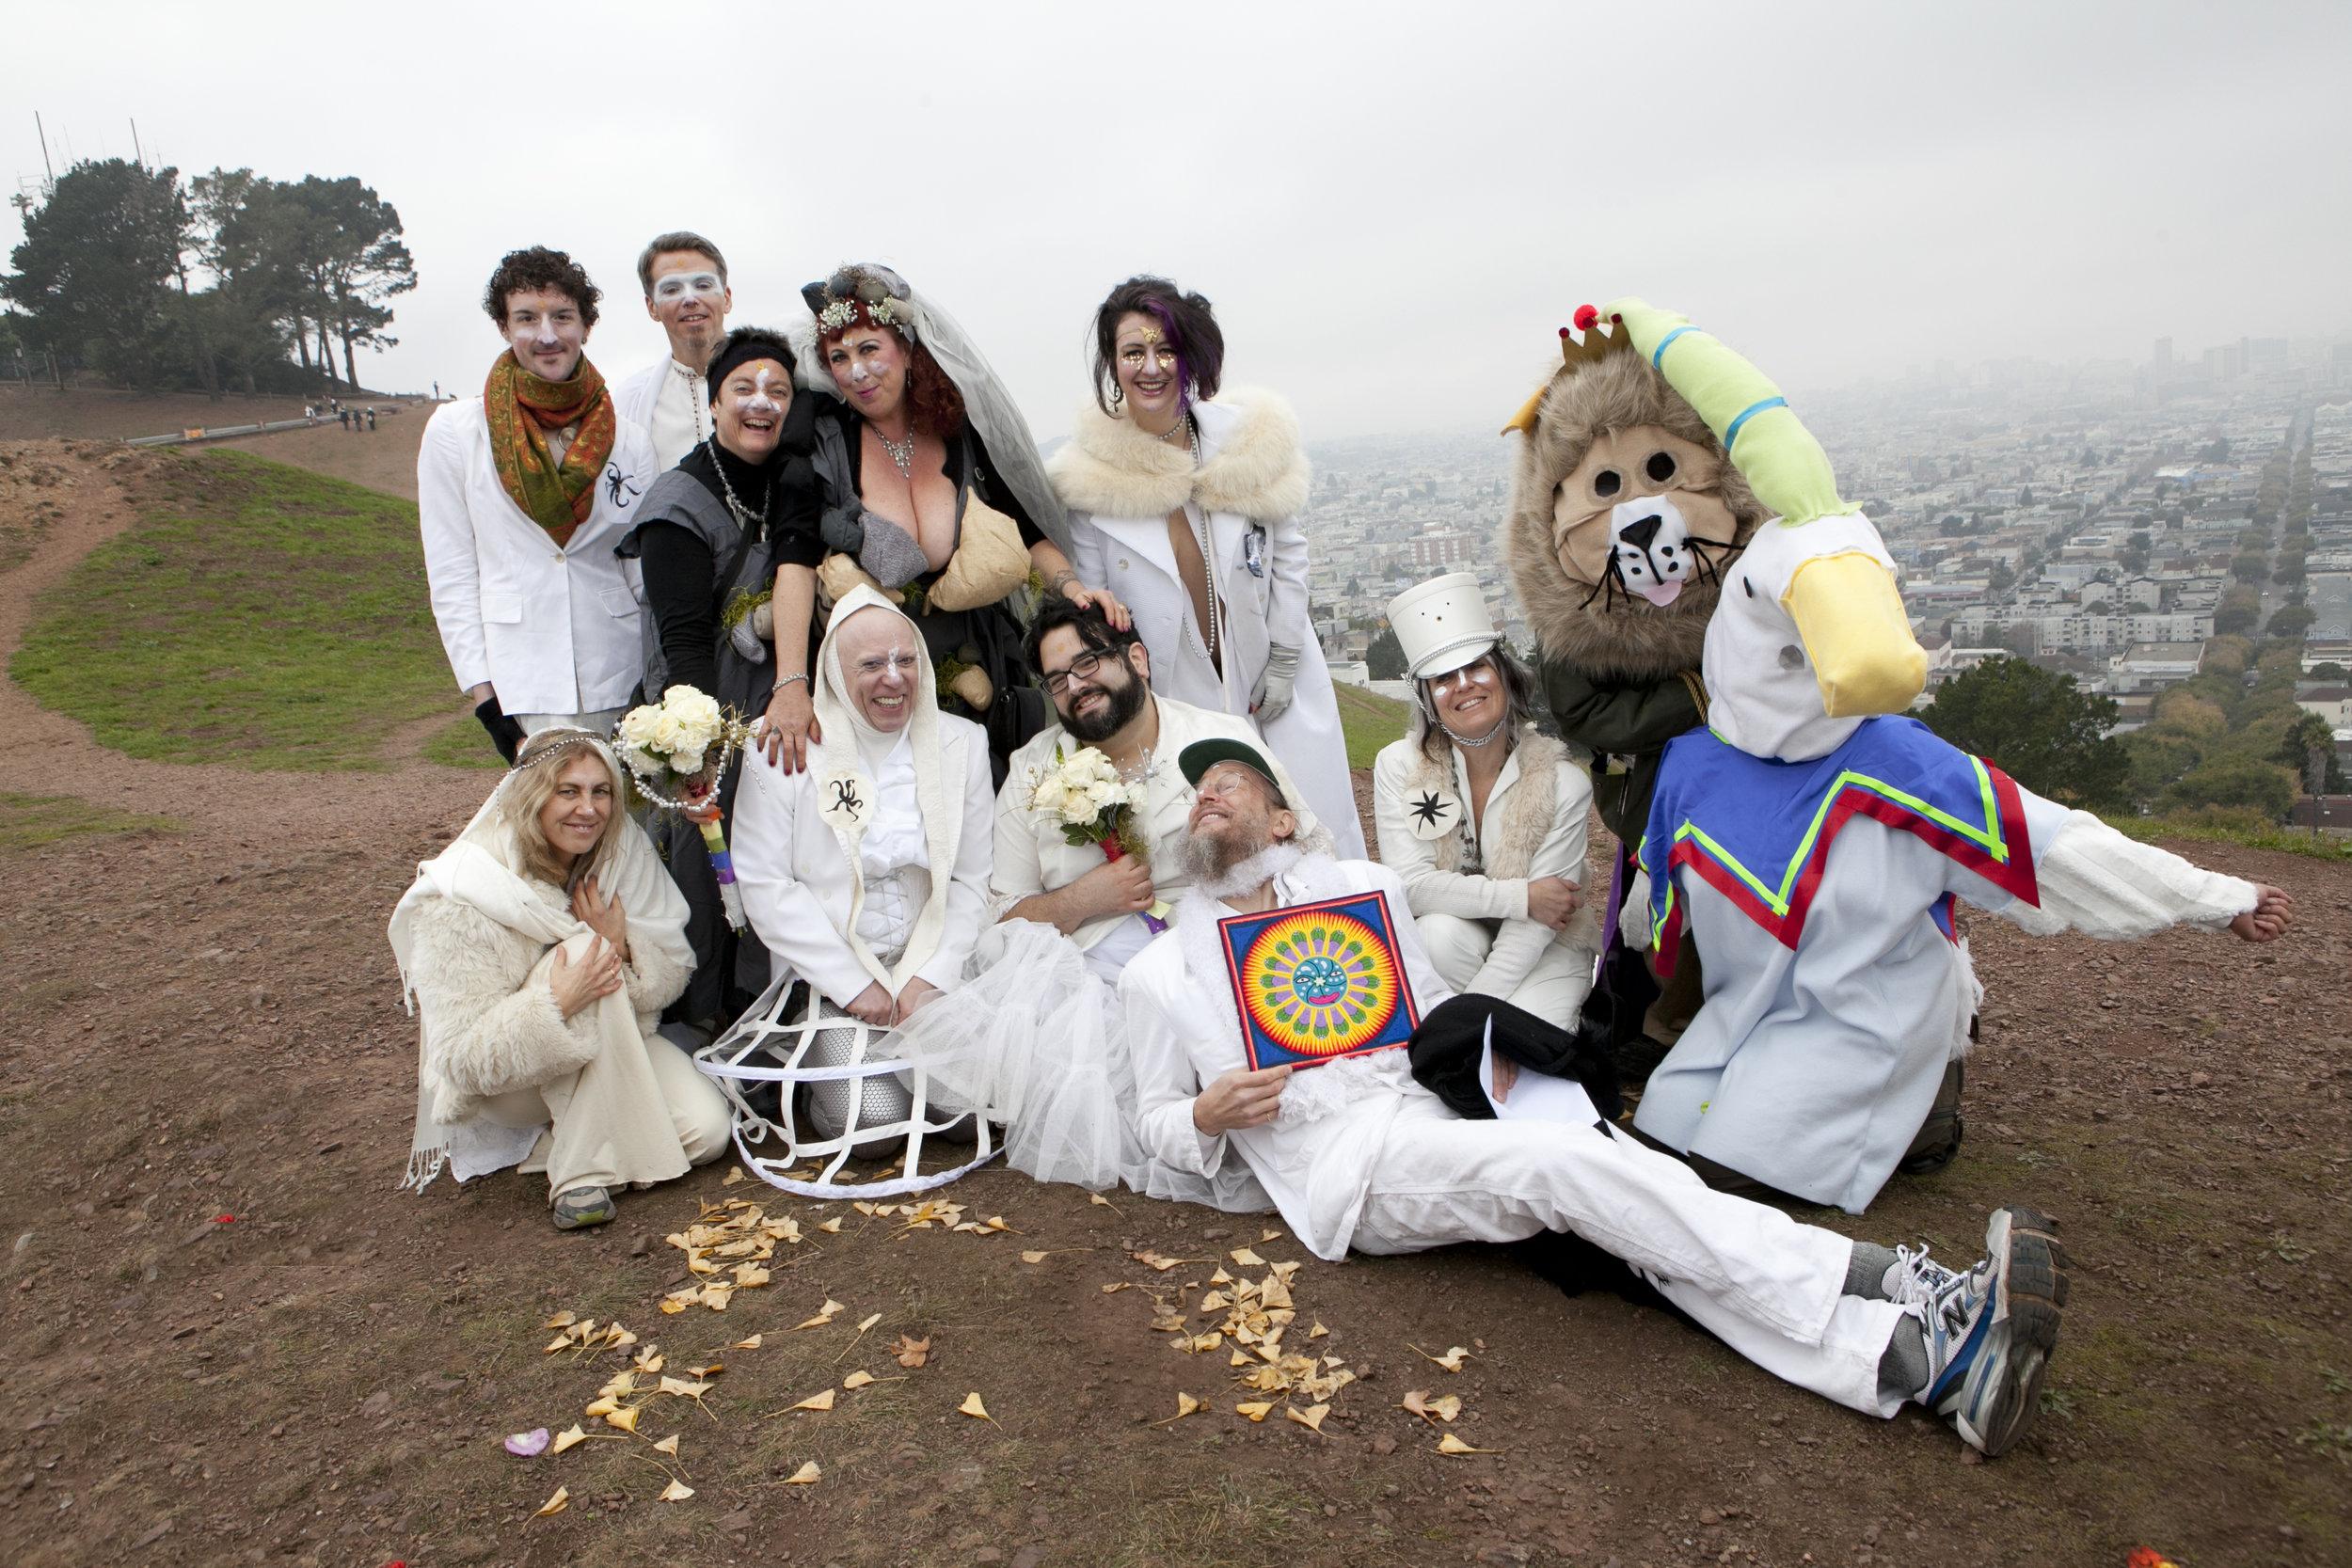 Photo by Liz Highleyman • The White Wedding to the Sun